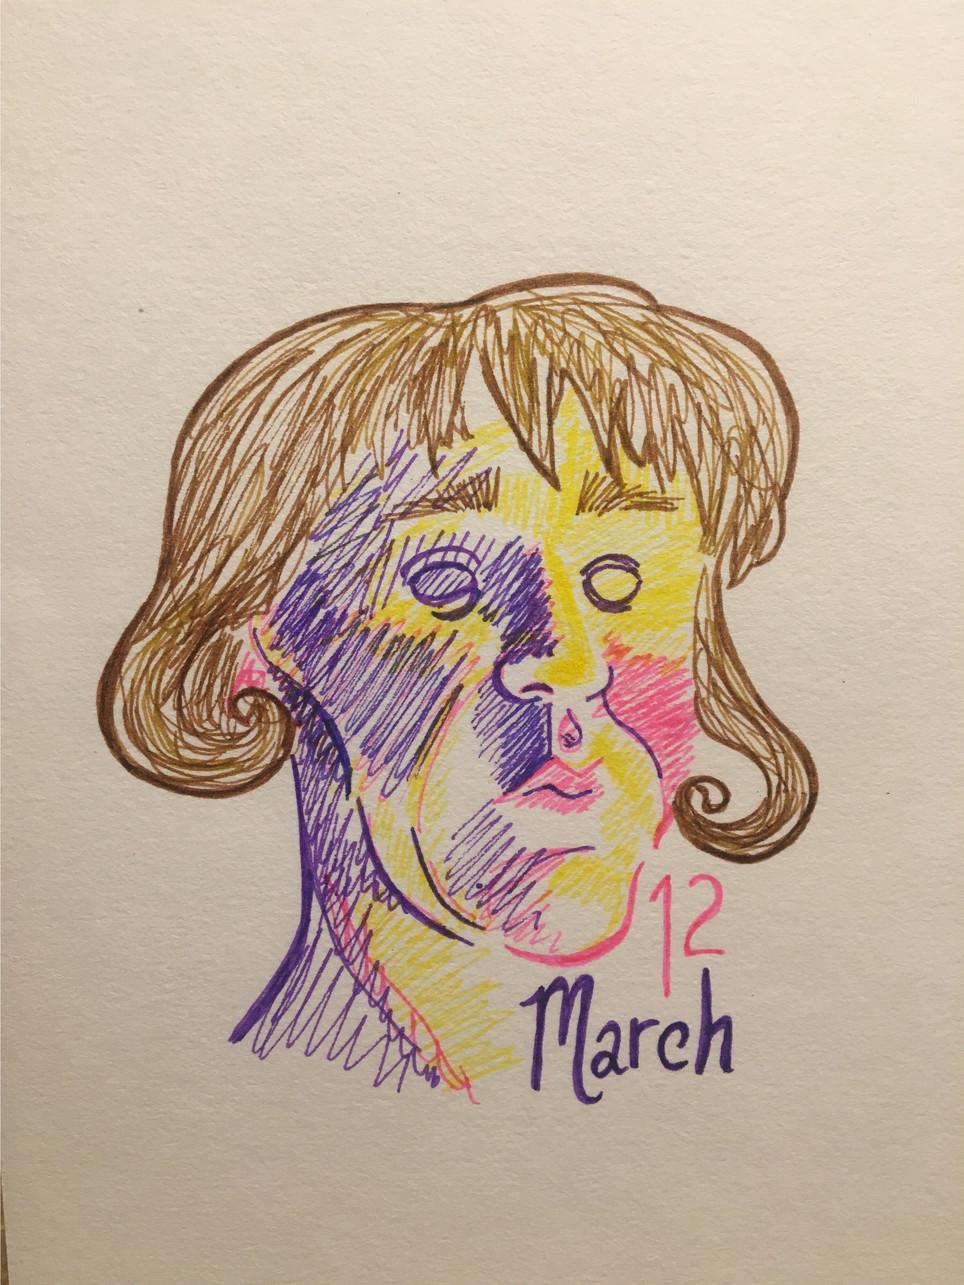 Self Portraits Week Ending March 17, 2018